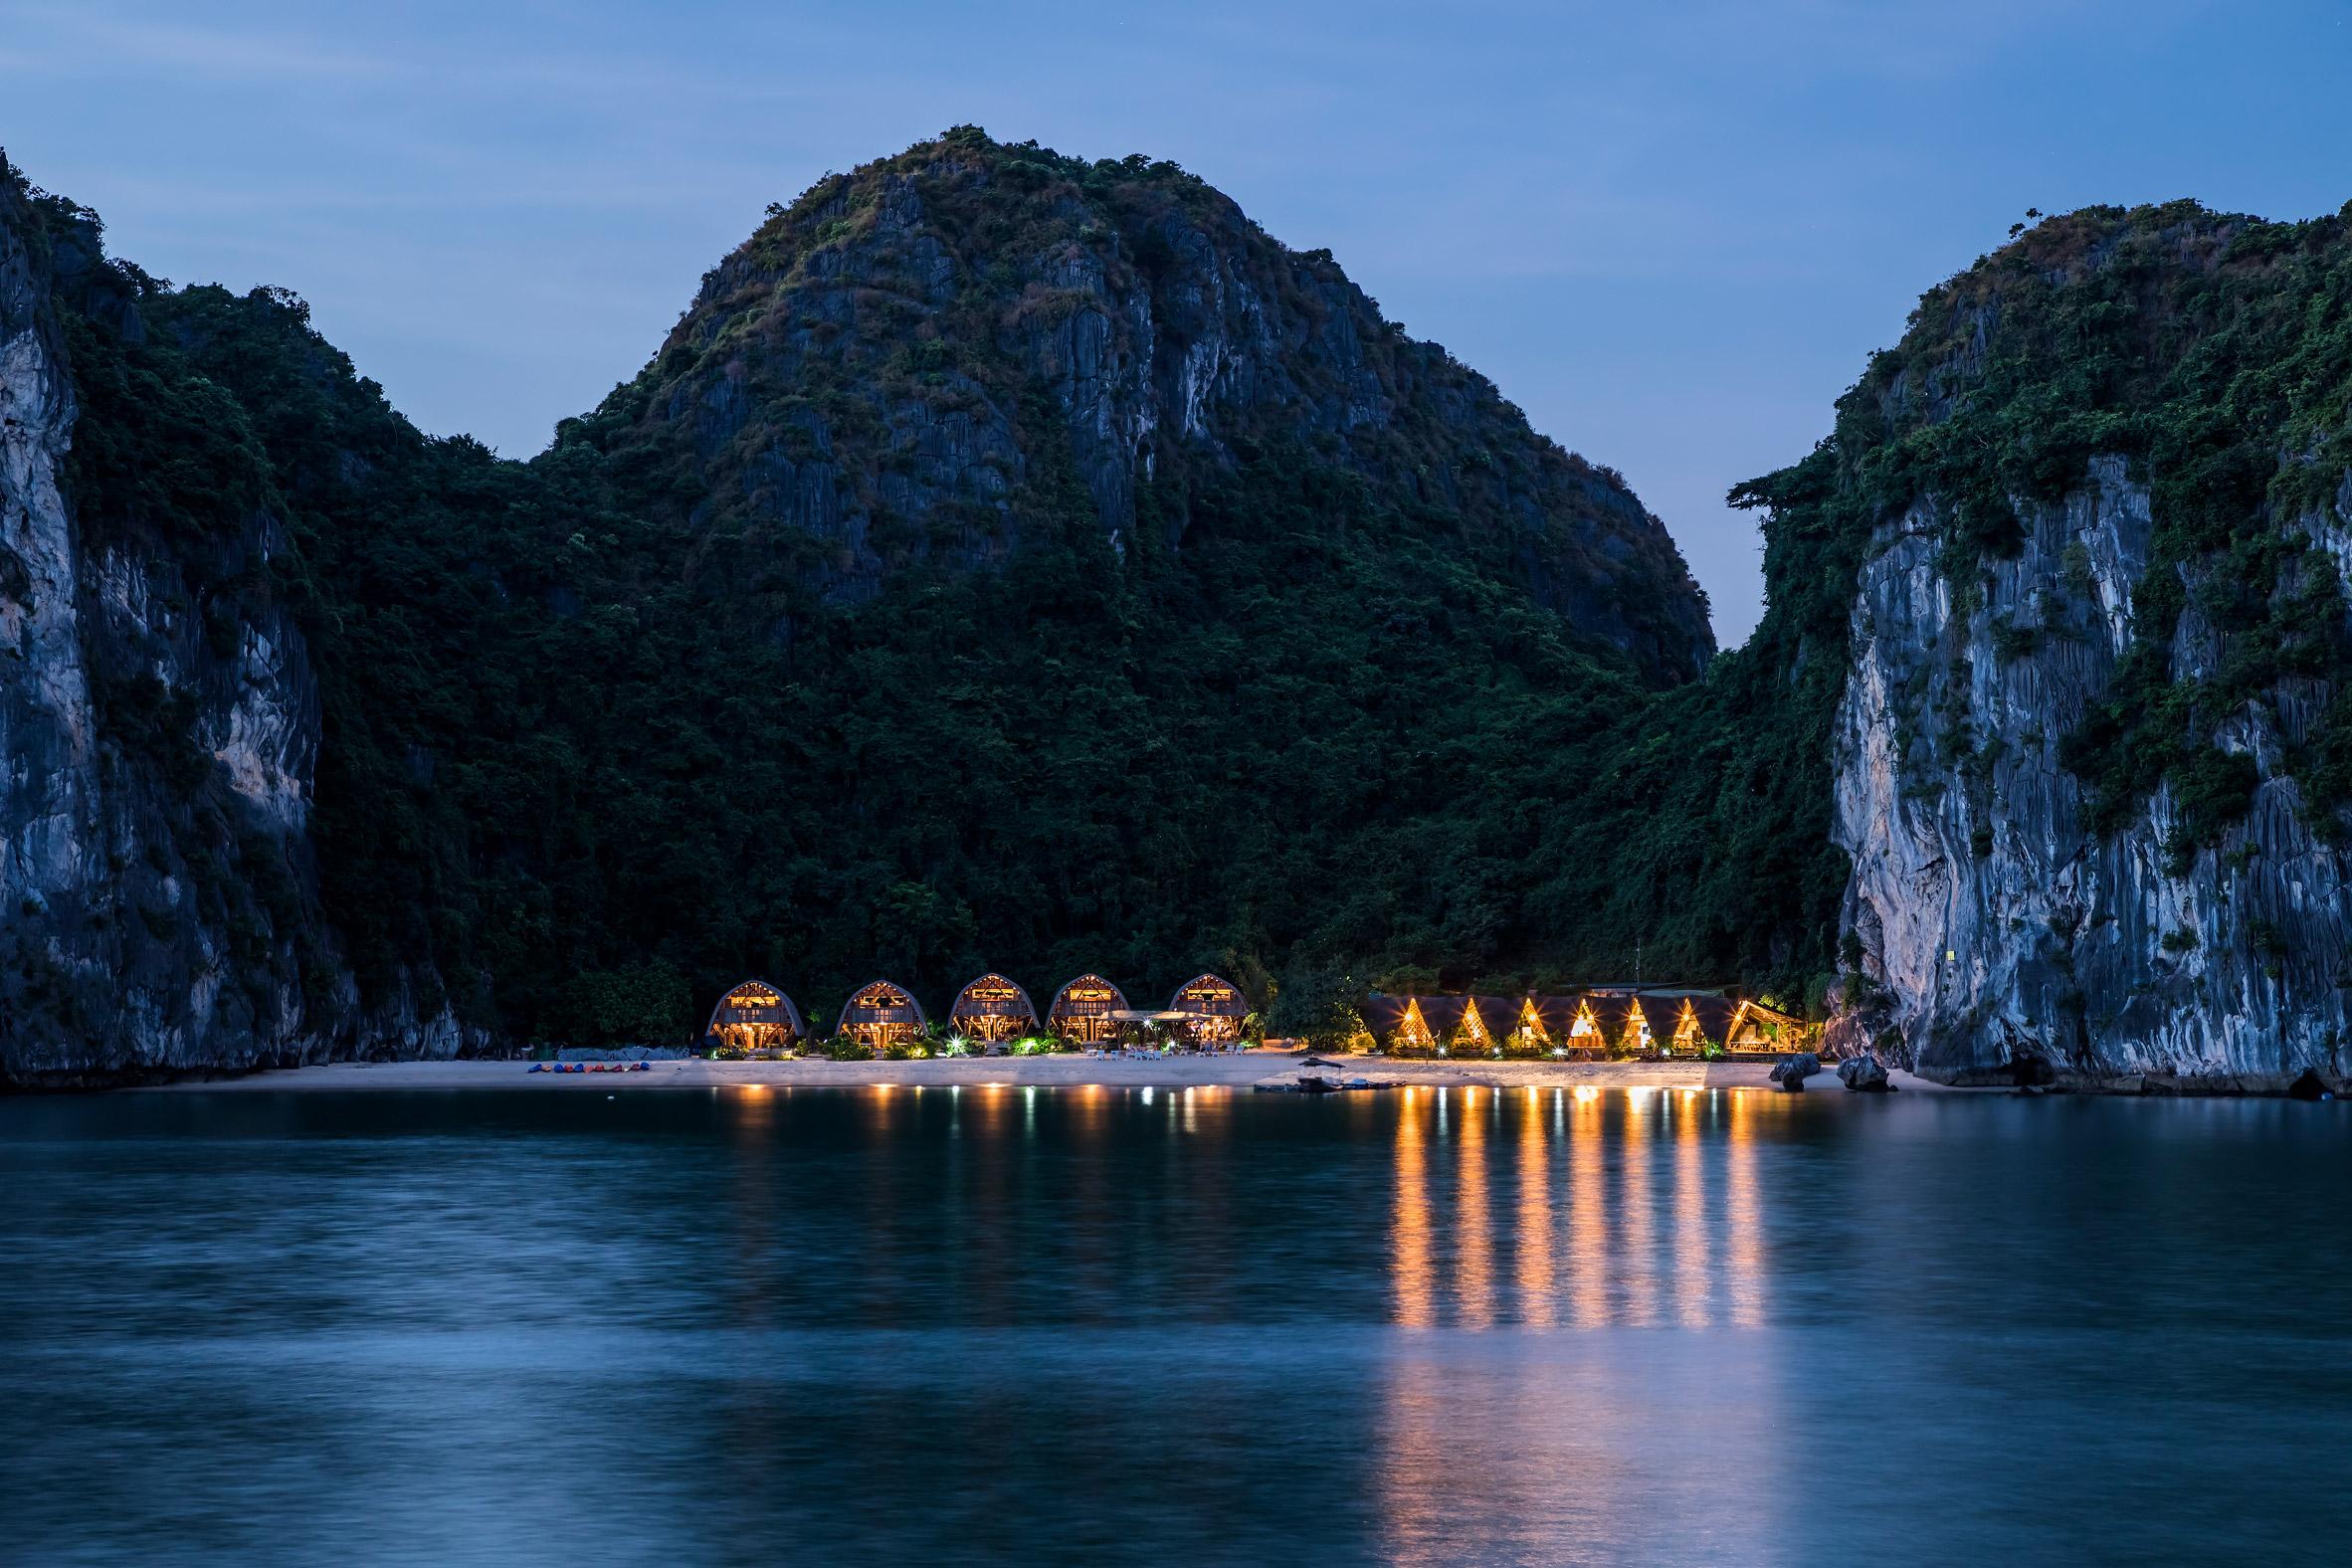 Thiết kế Resort biển 24